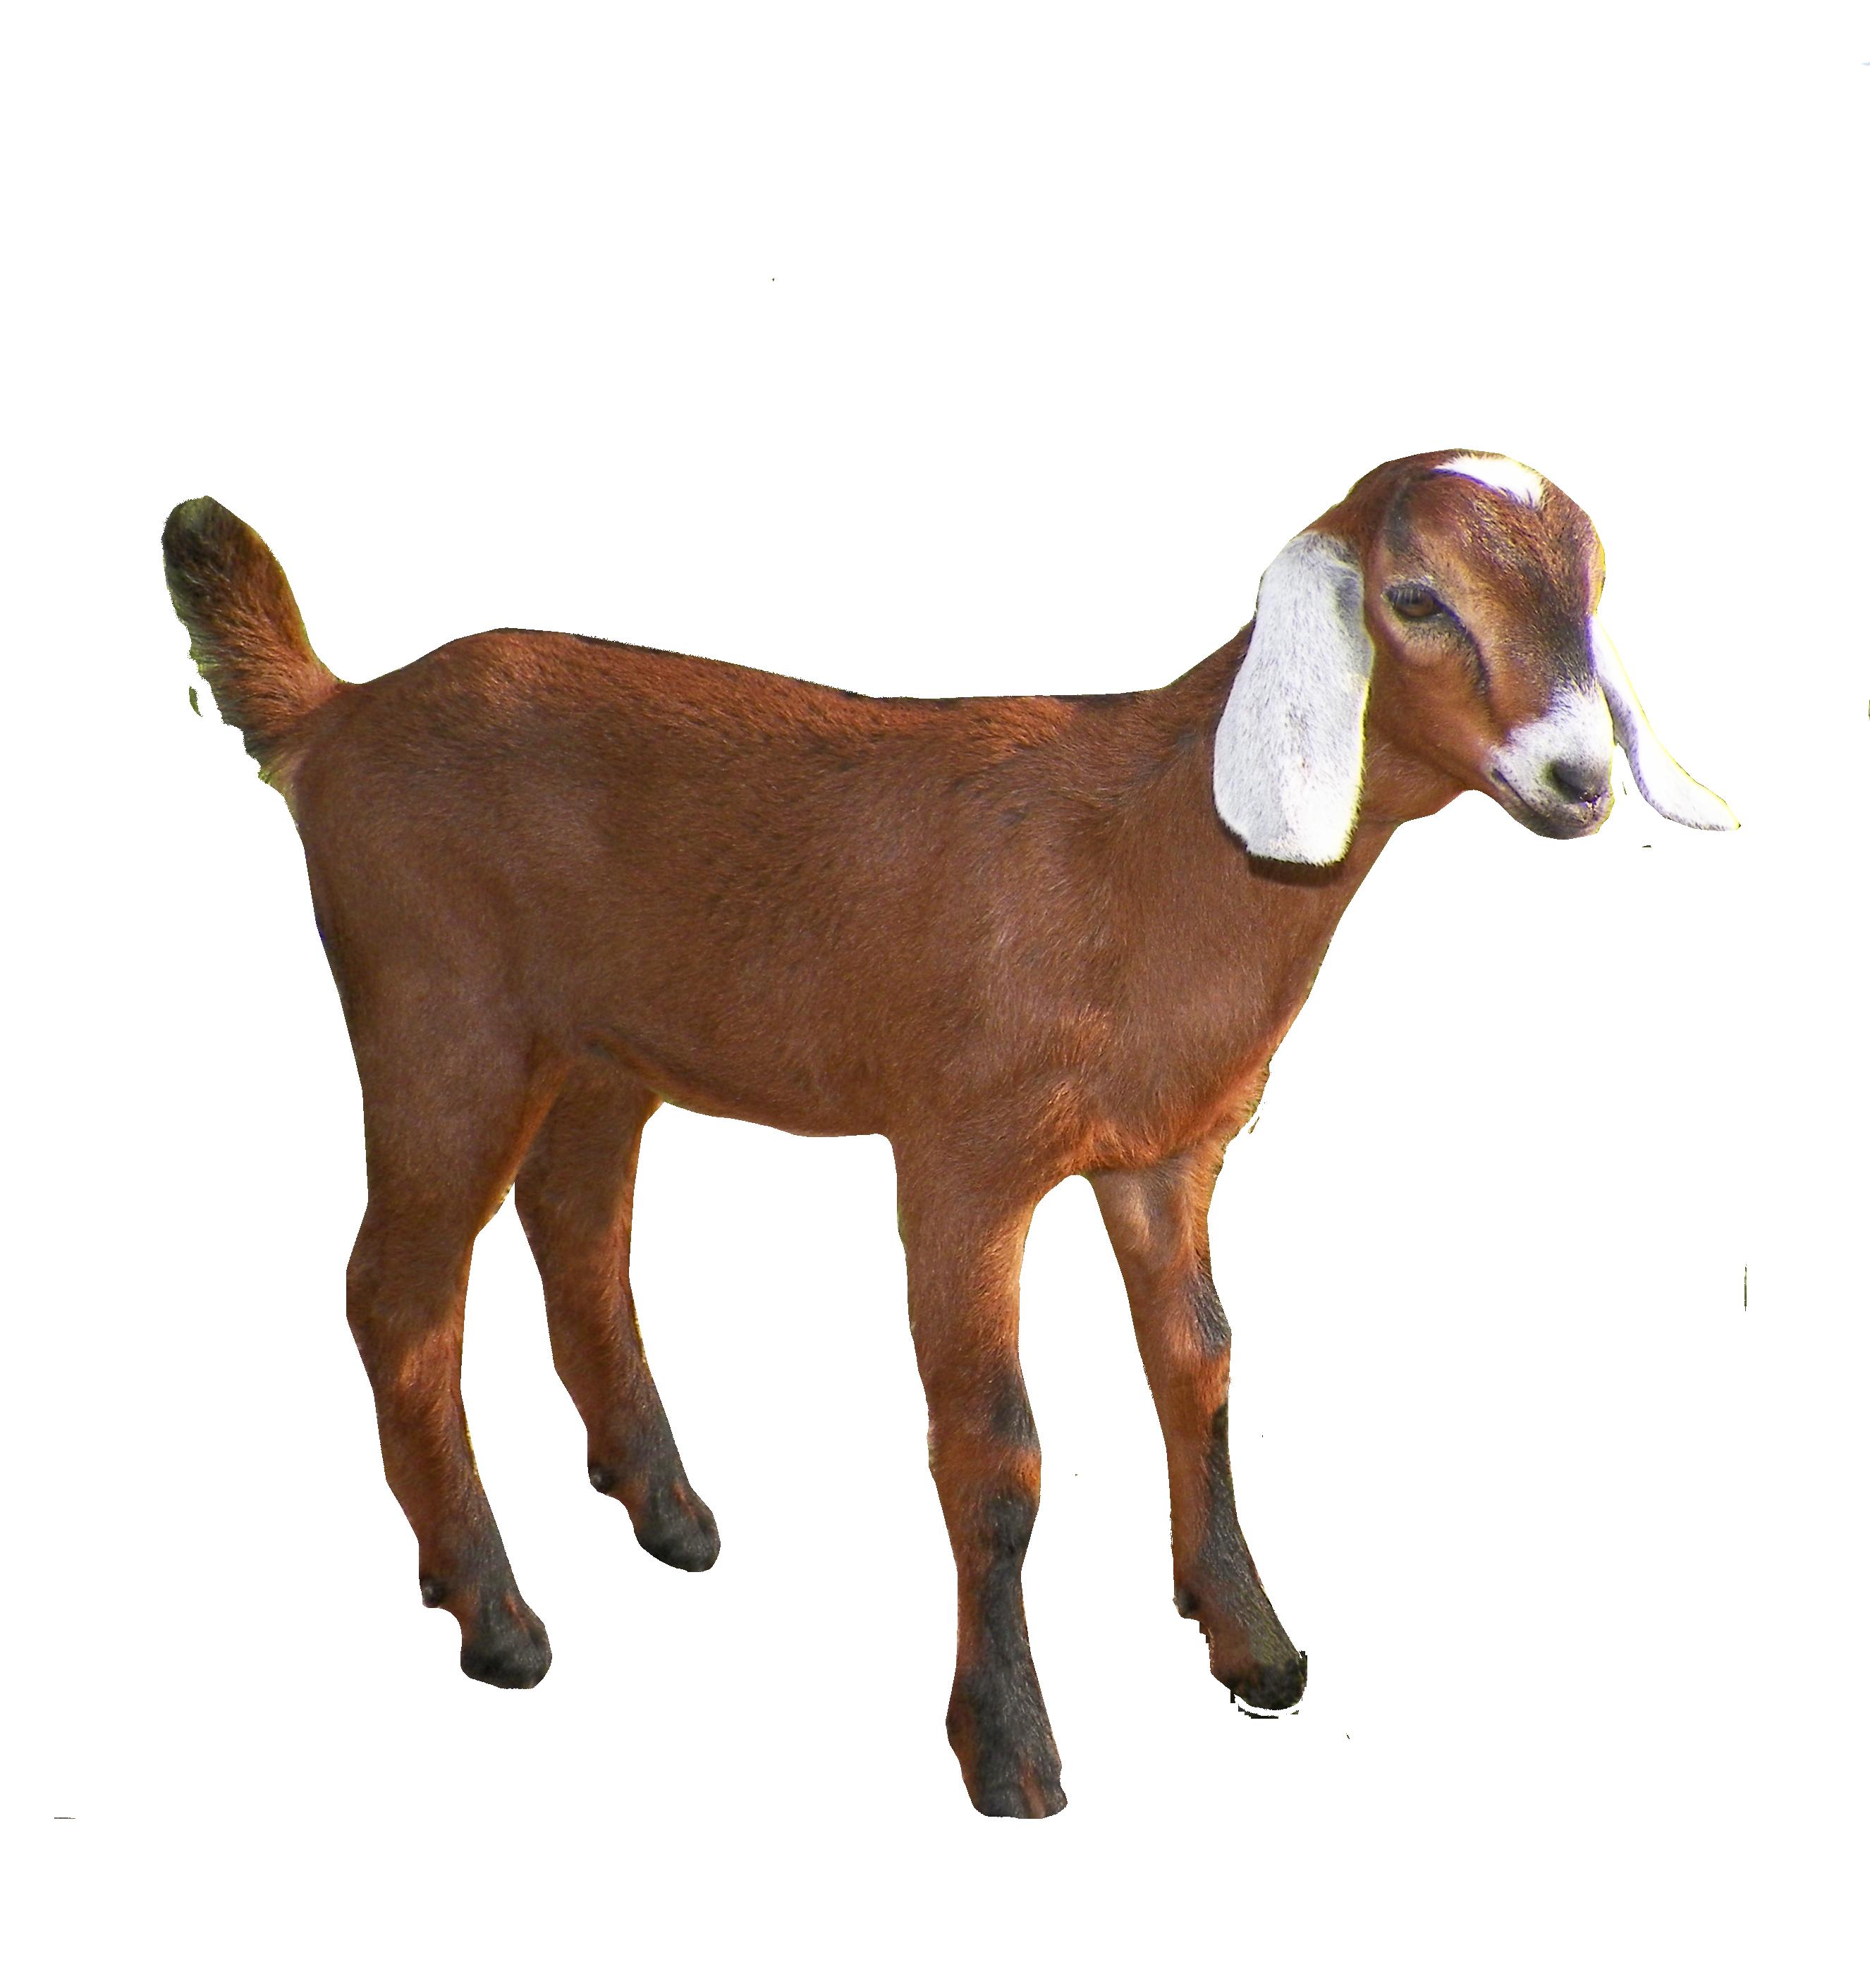 Goat PNG - 15770